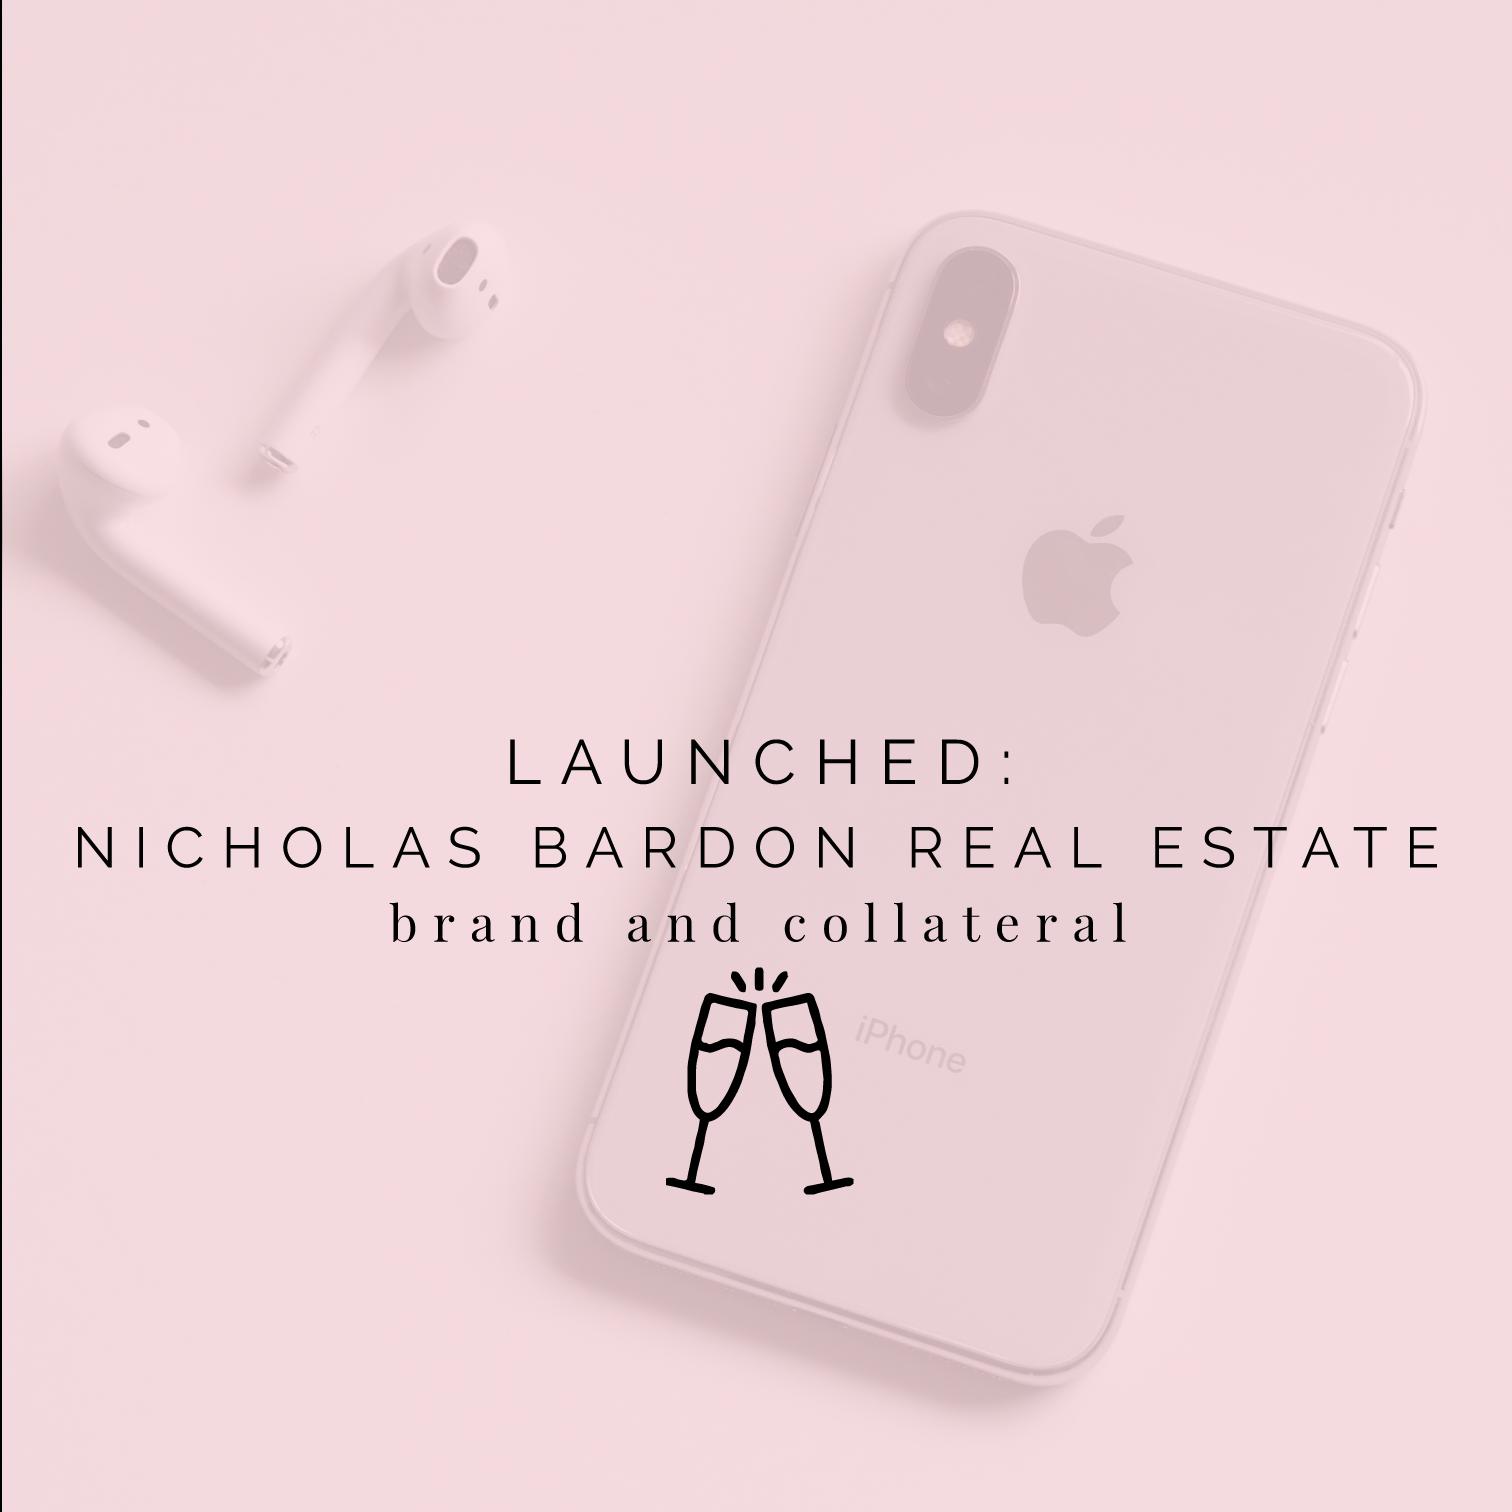 Launched: Nicholas Bardon